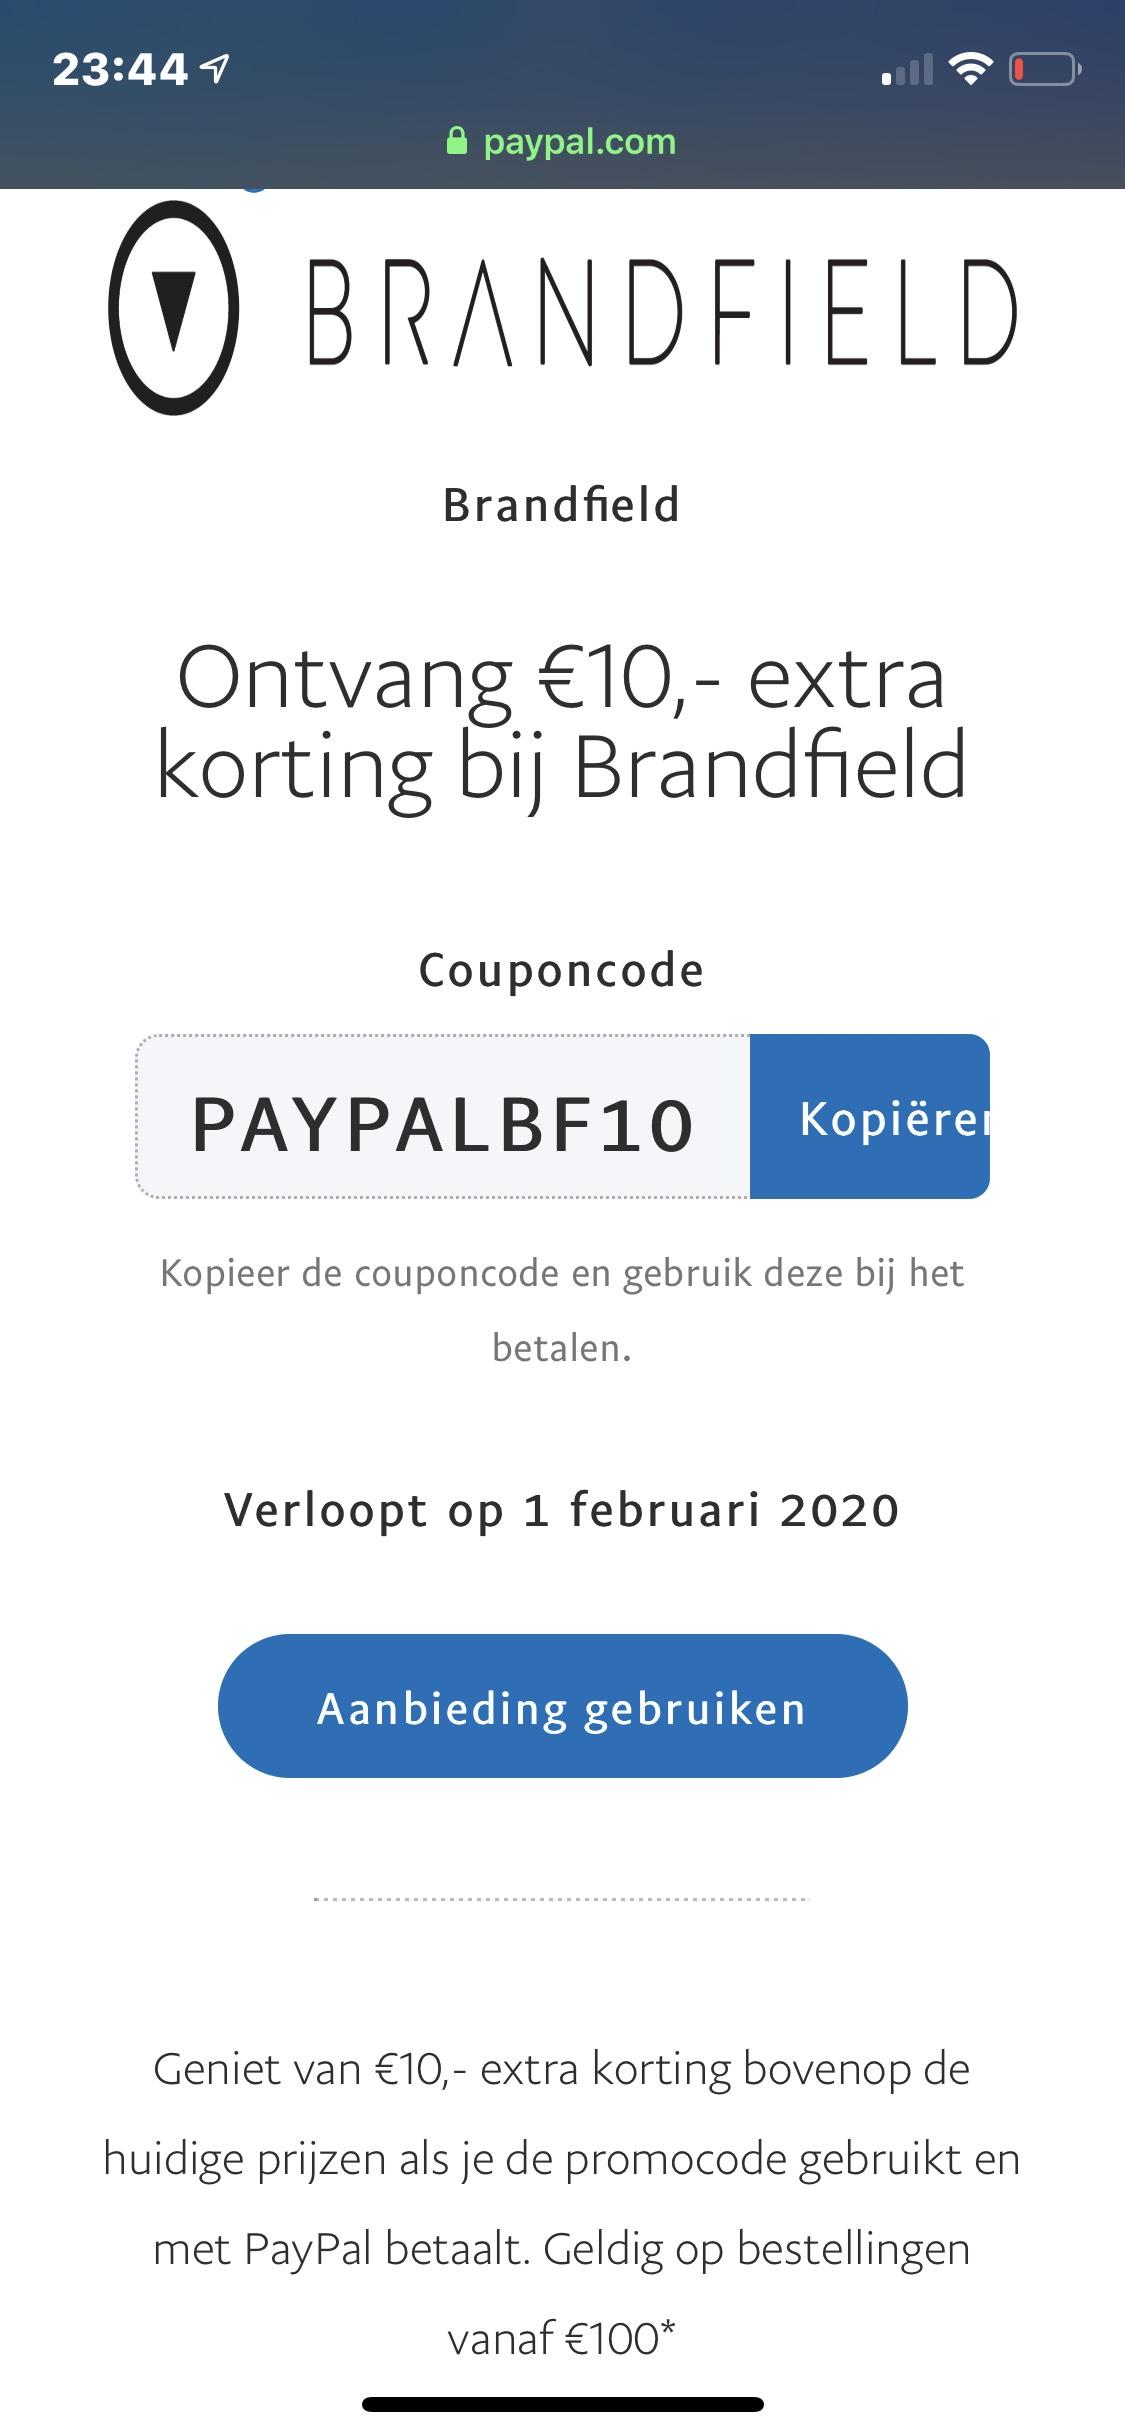 10 euro korting bij brandfield vanaf €100 + armband